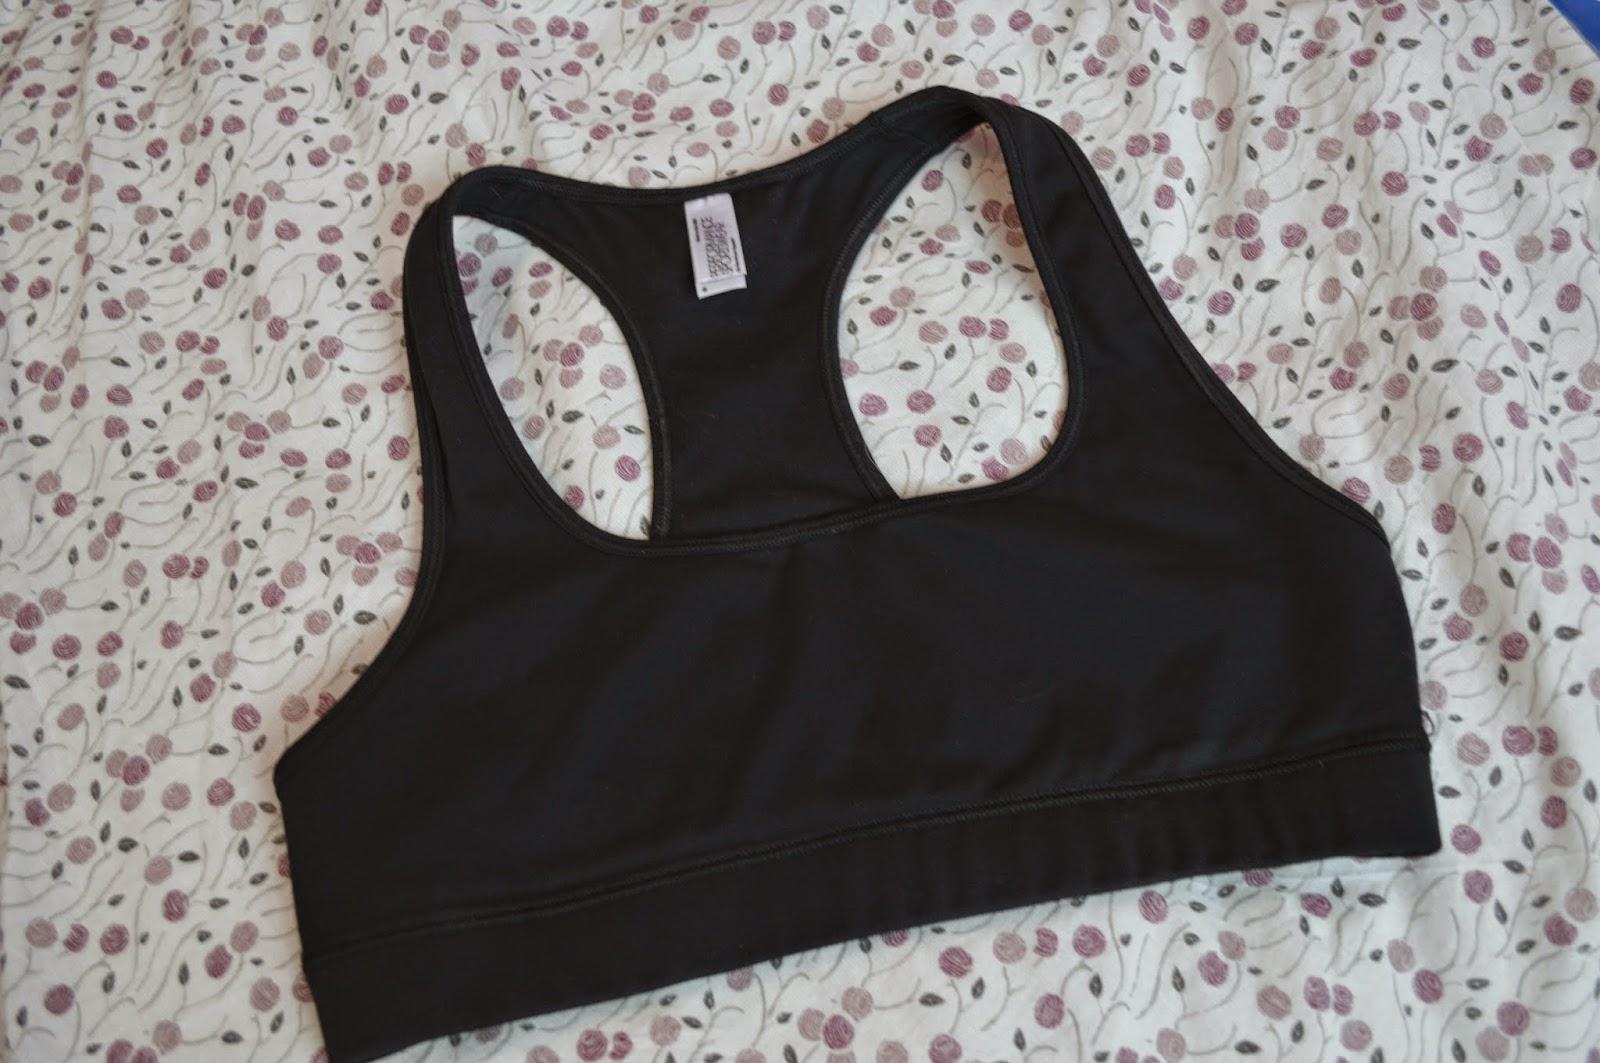 3a2e7551f77aeb 3 Summer Sporting/Fitness Staples - Melissa Jane Marshall